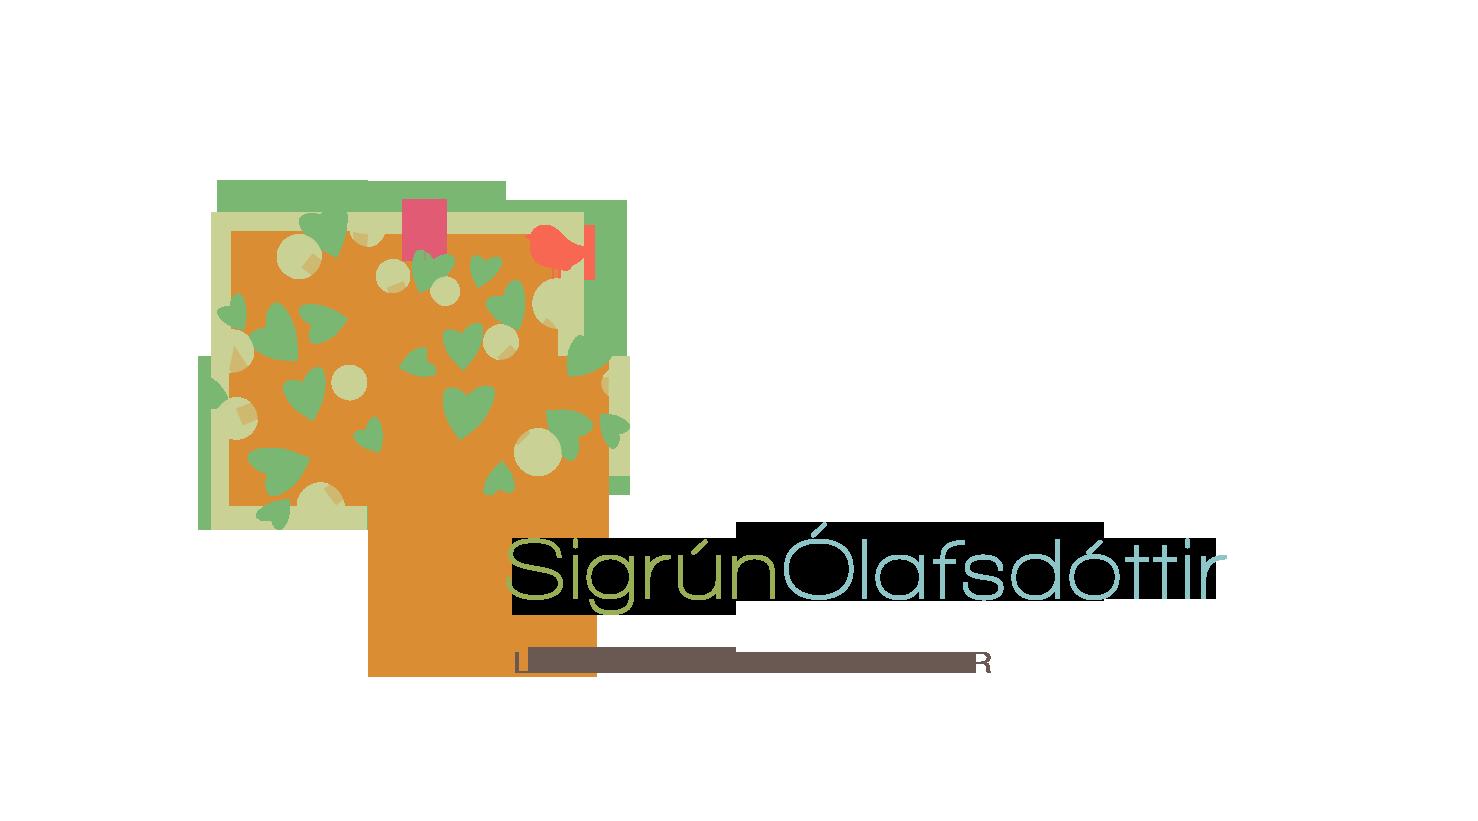 Sigrún Ólafsdóttir Ljósmyndir